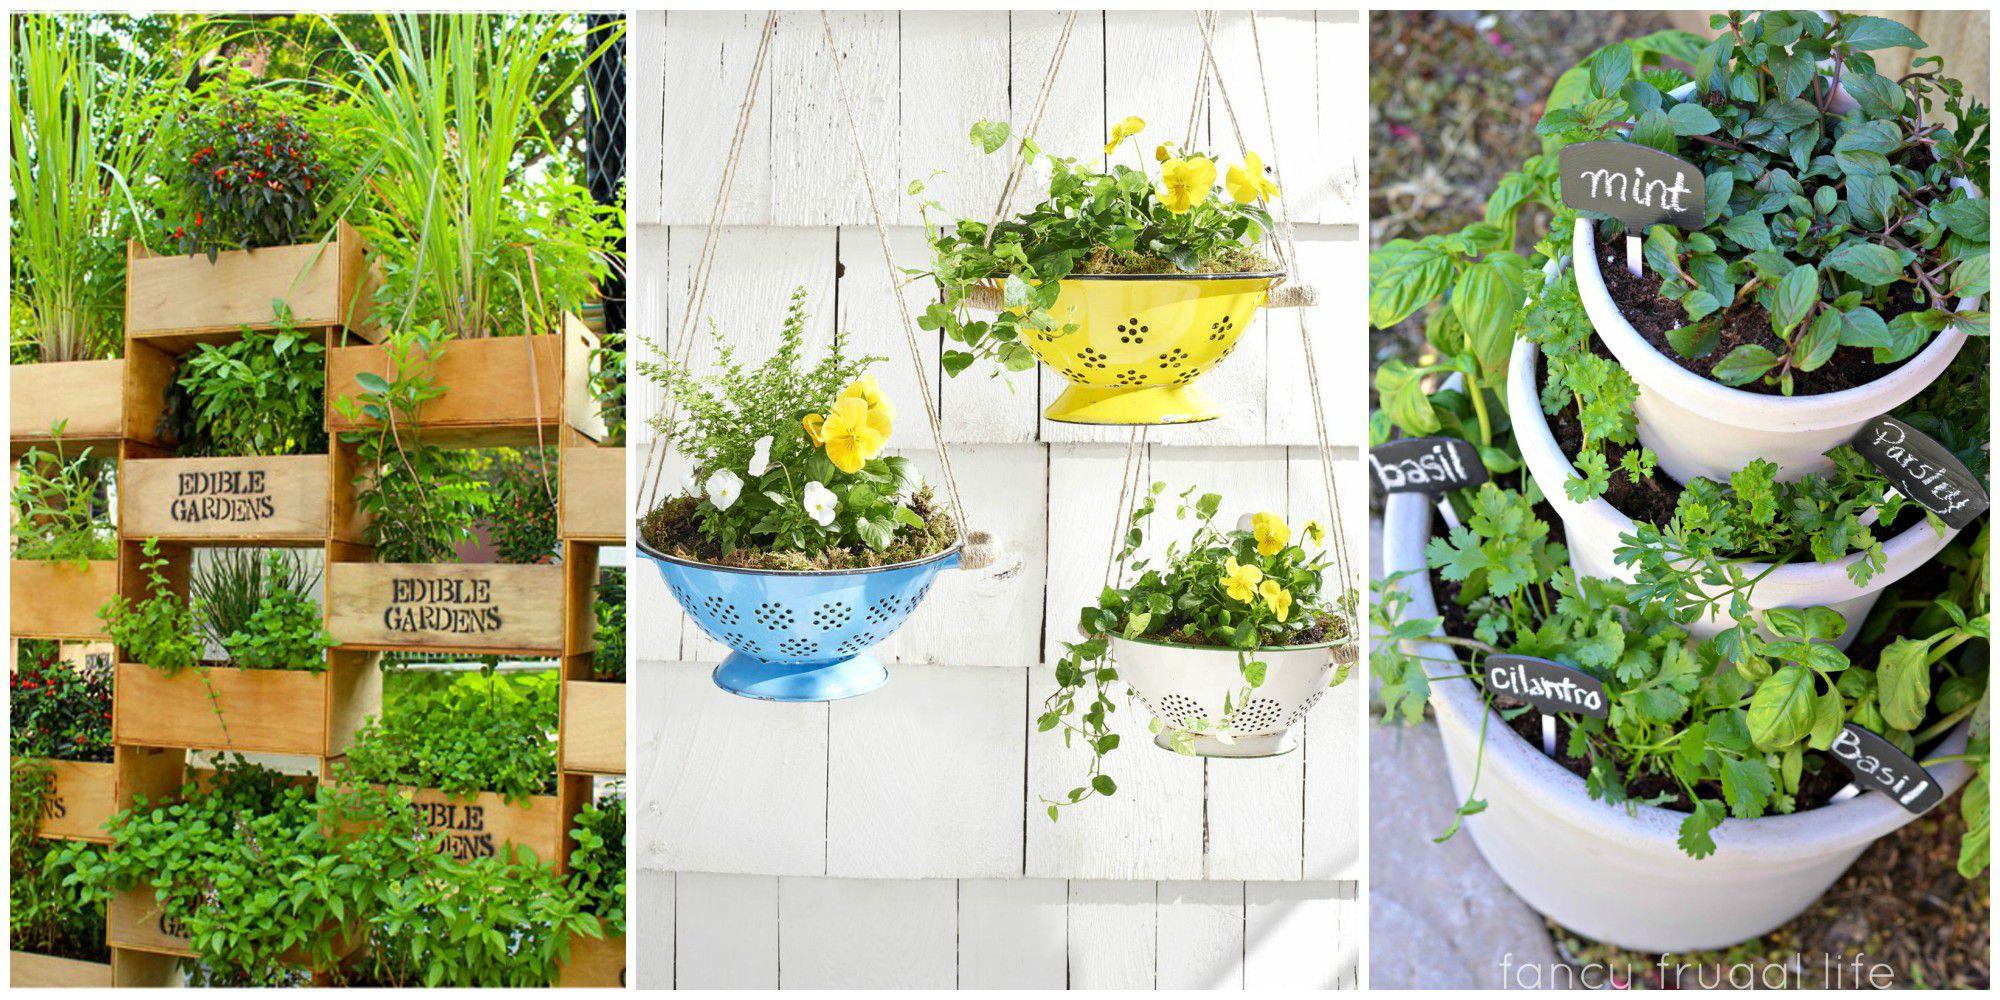 backyard garden ideas 25 small backyard ideas - beautiful landscaping designs for tiny yards SZZFBVP